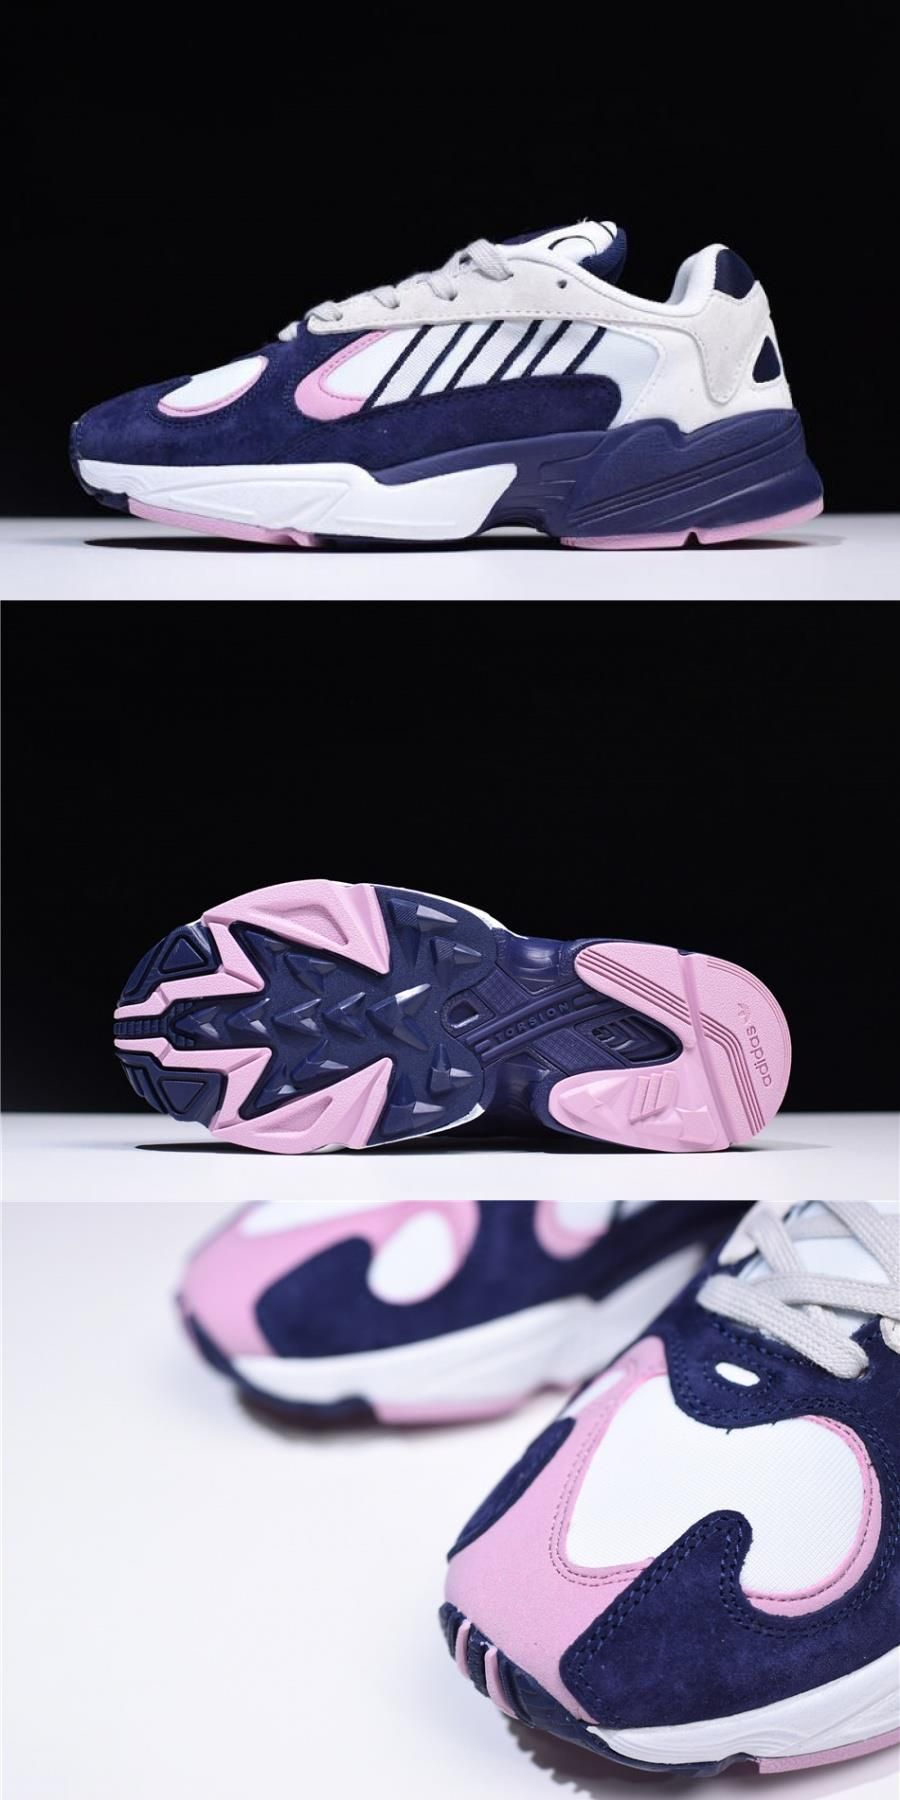 Dragon Ball Z X Adidas Originals Yung1 White/purplepink